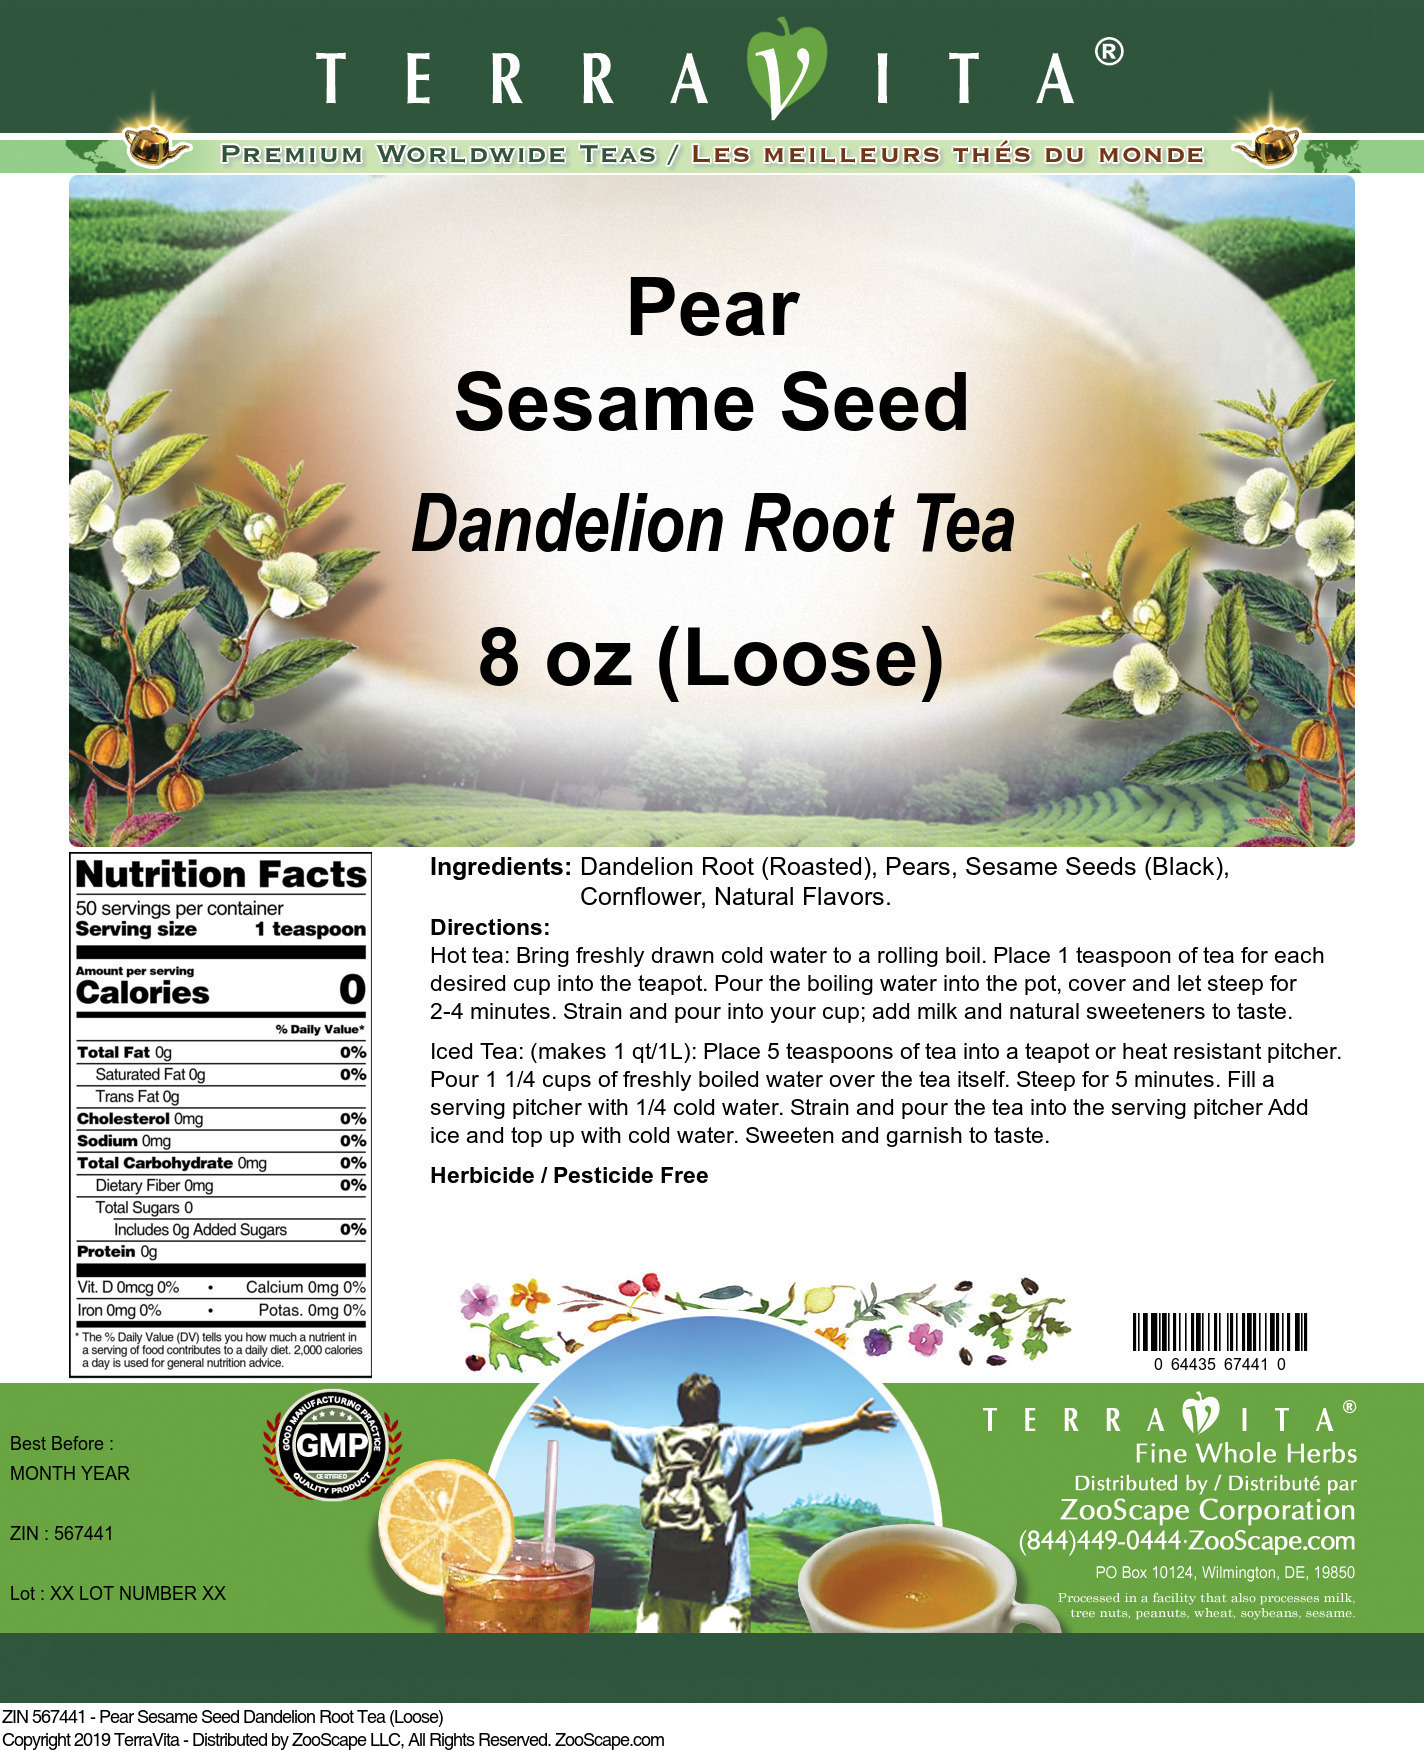 Pear Sesame Seed Dandelion Root Tea (Loose)